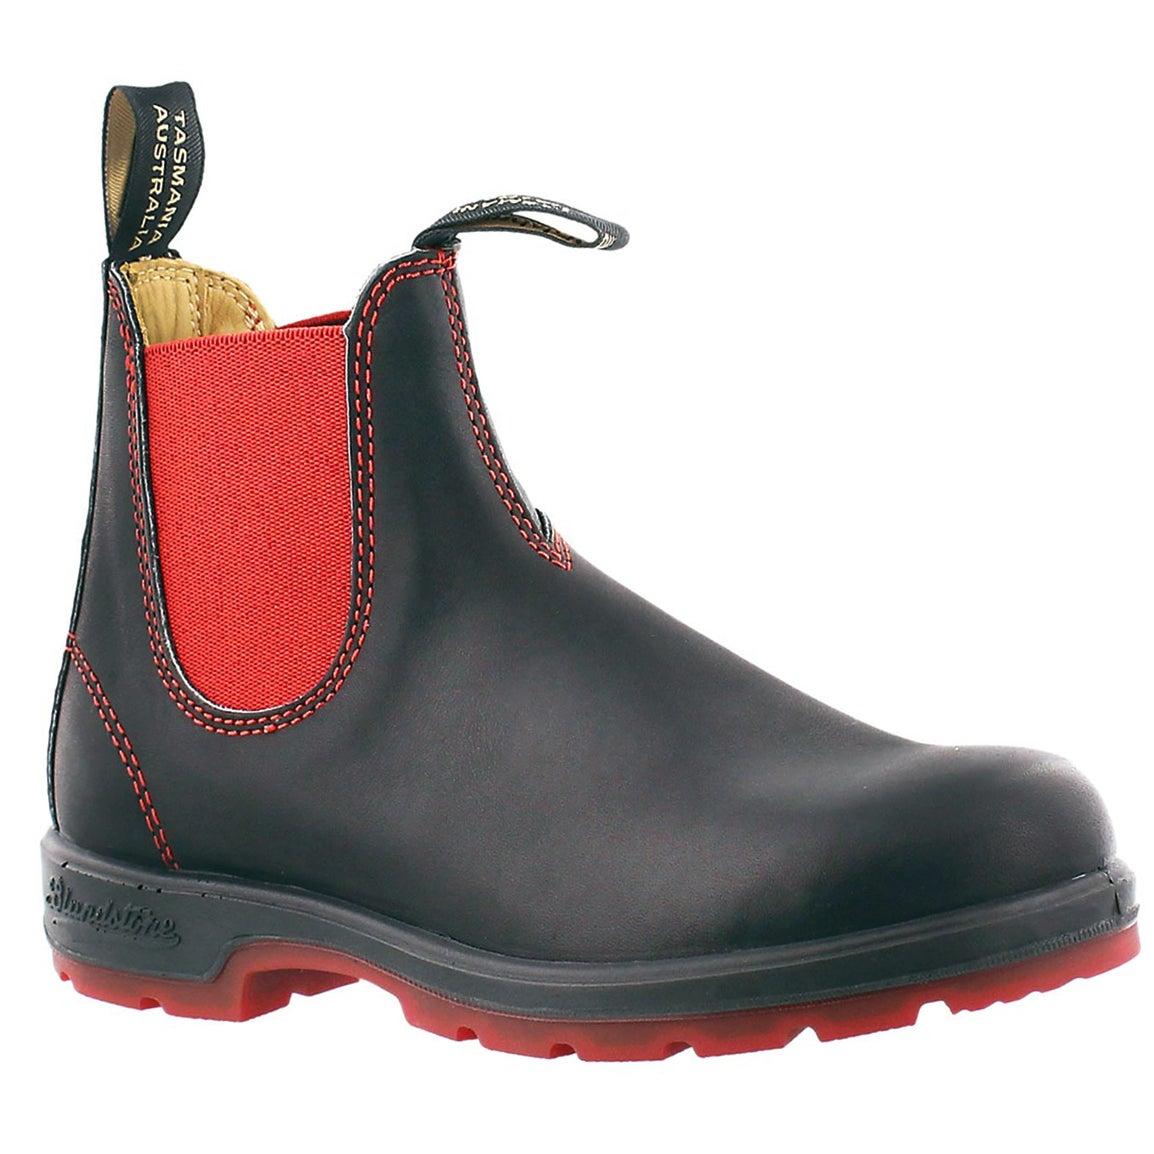 Unisex Original black/red twin gore boot